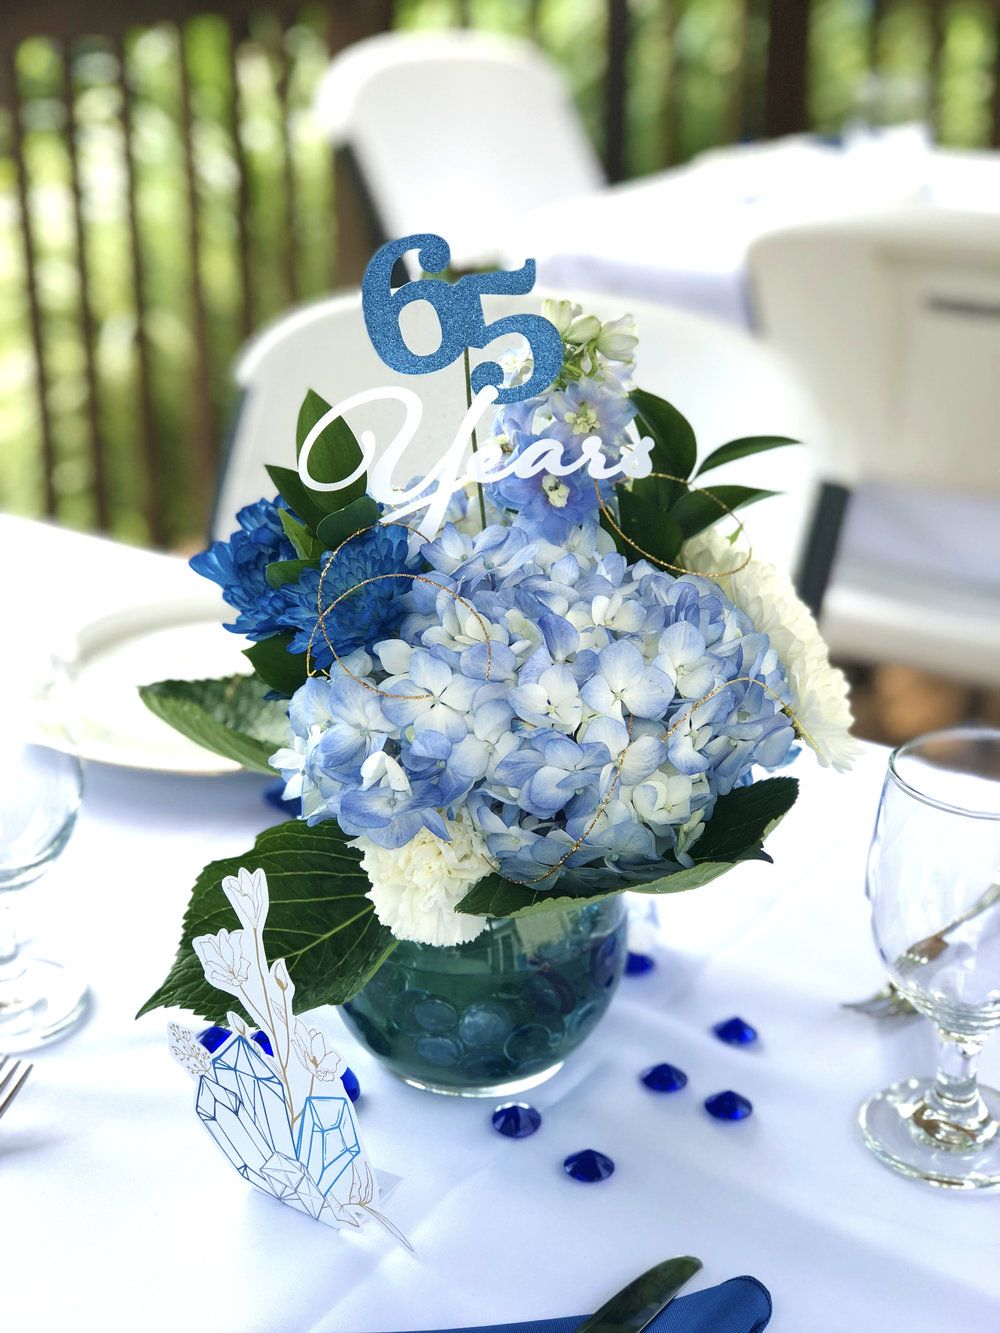 65 Years Floral Arrangements. So cute! 65th Wedding